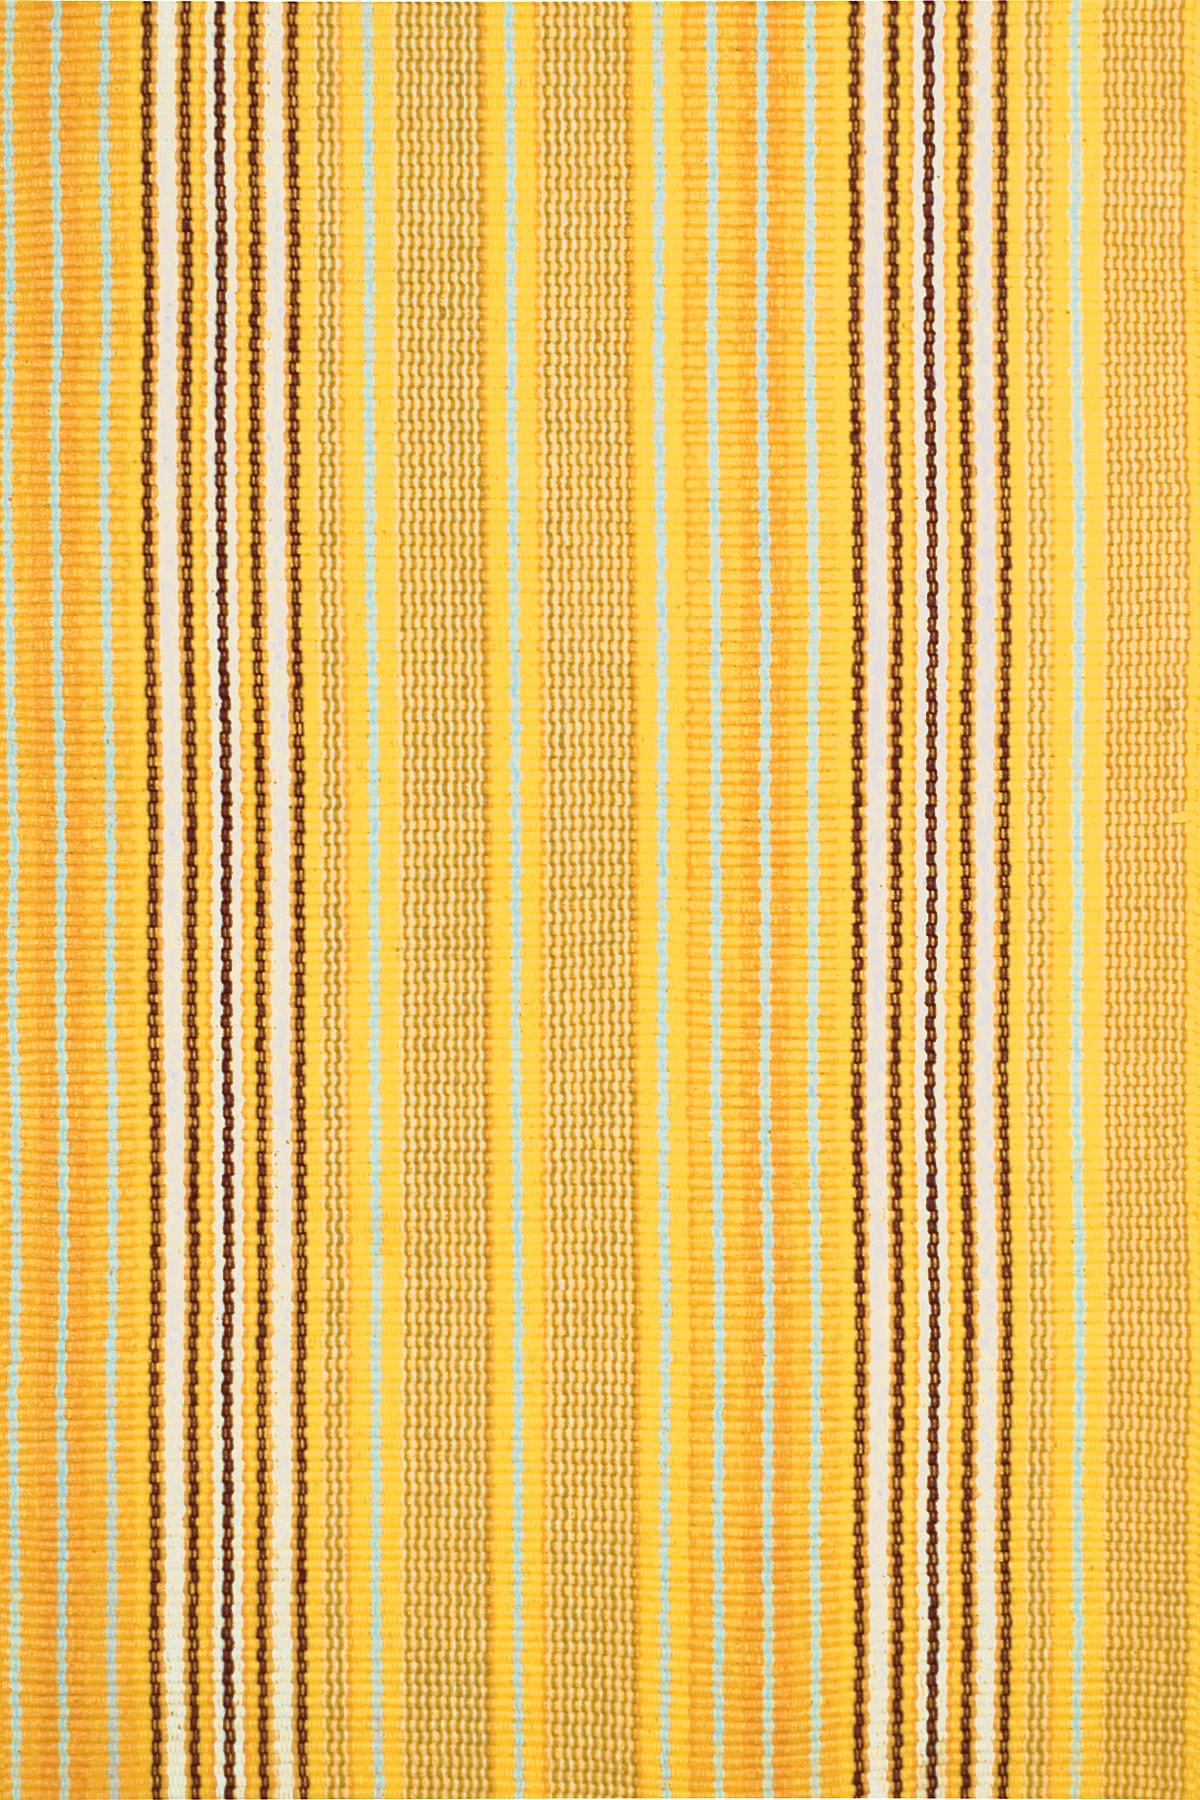 Sunflower Ticking Woven Cotton Rug